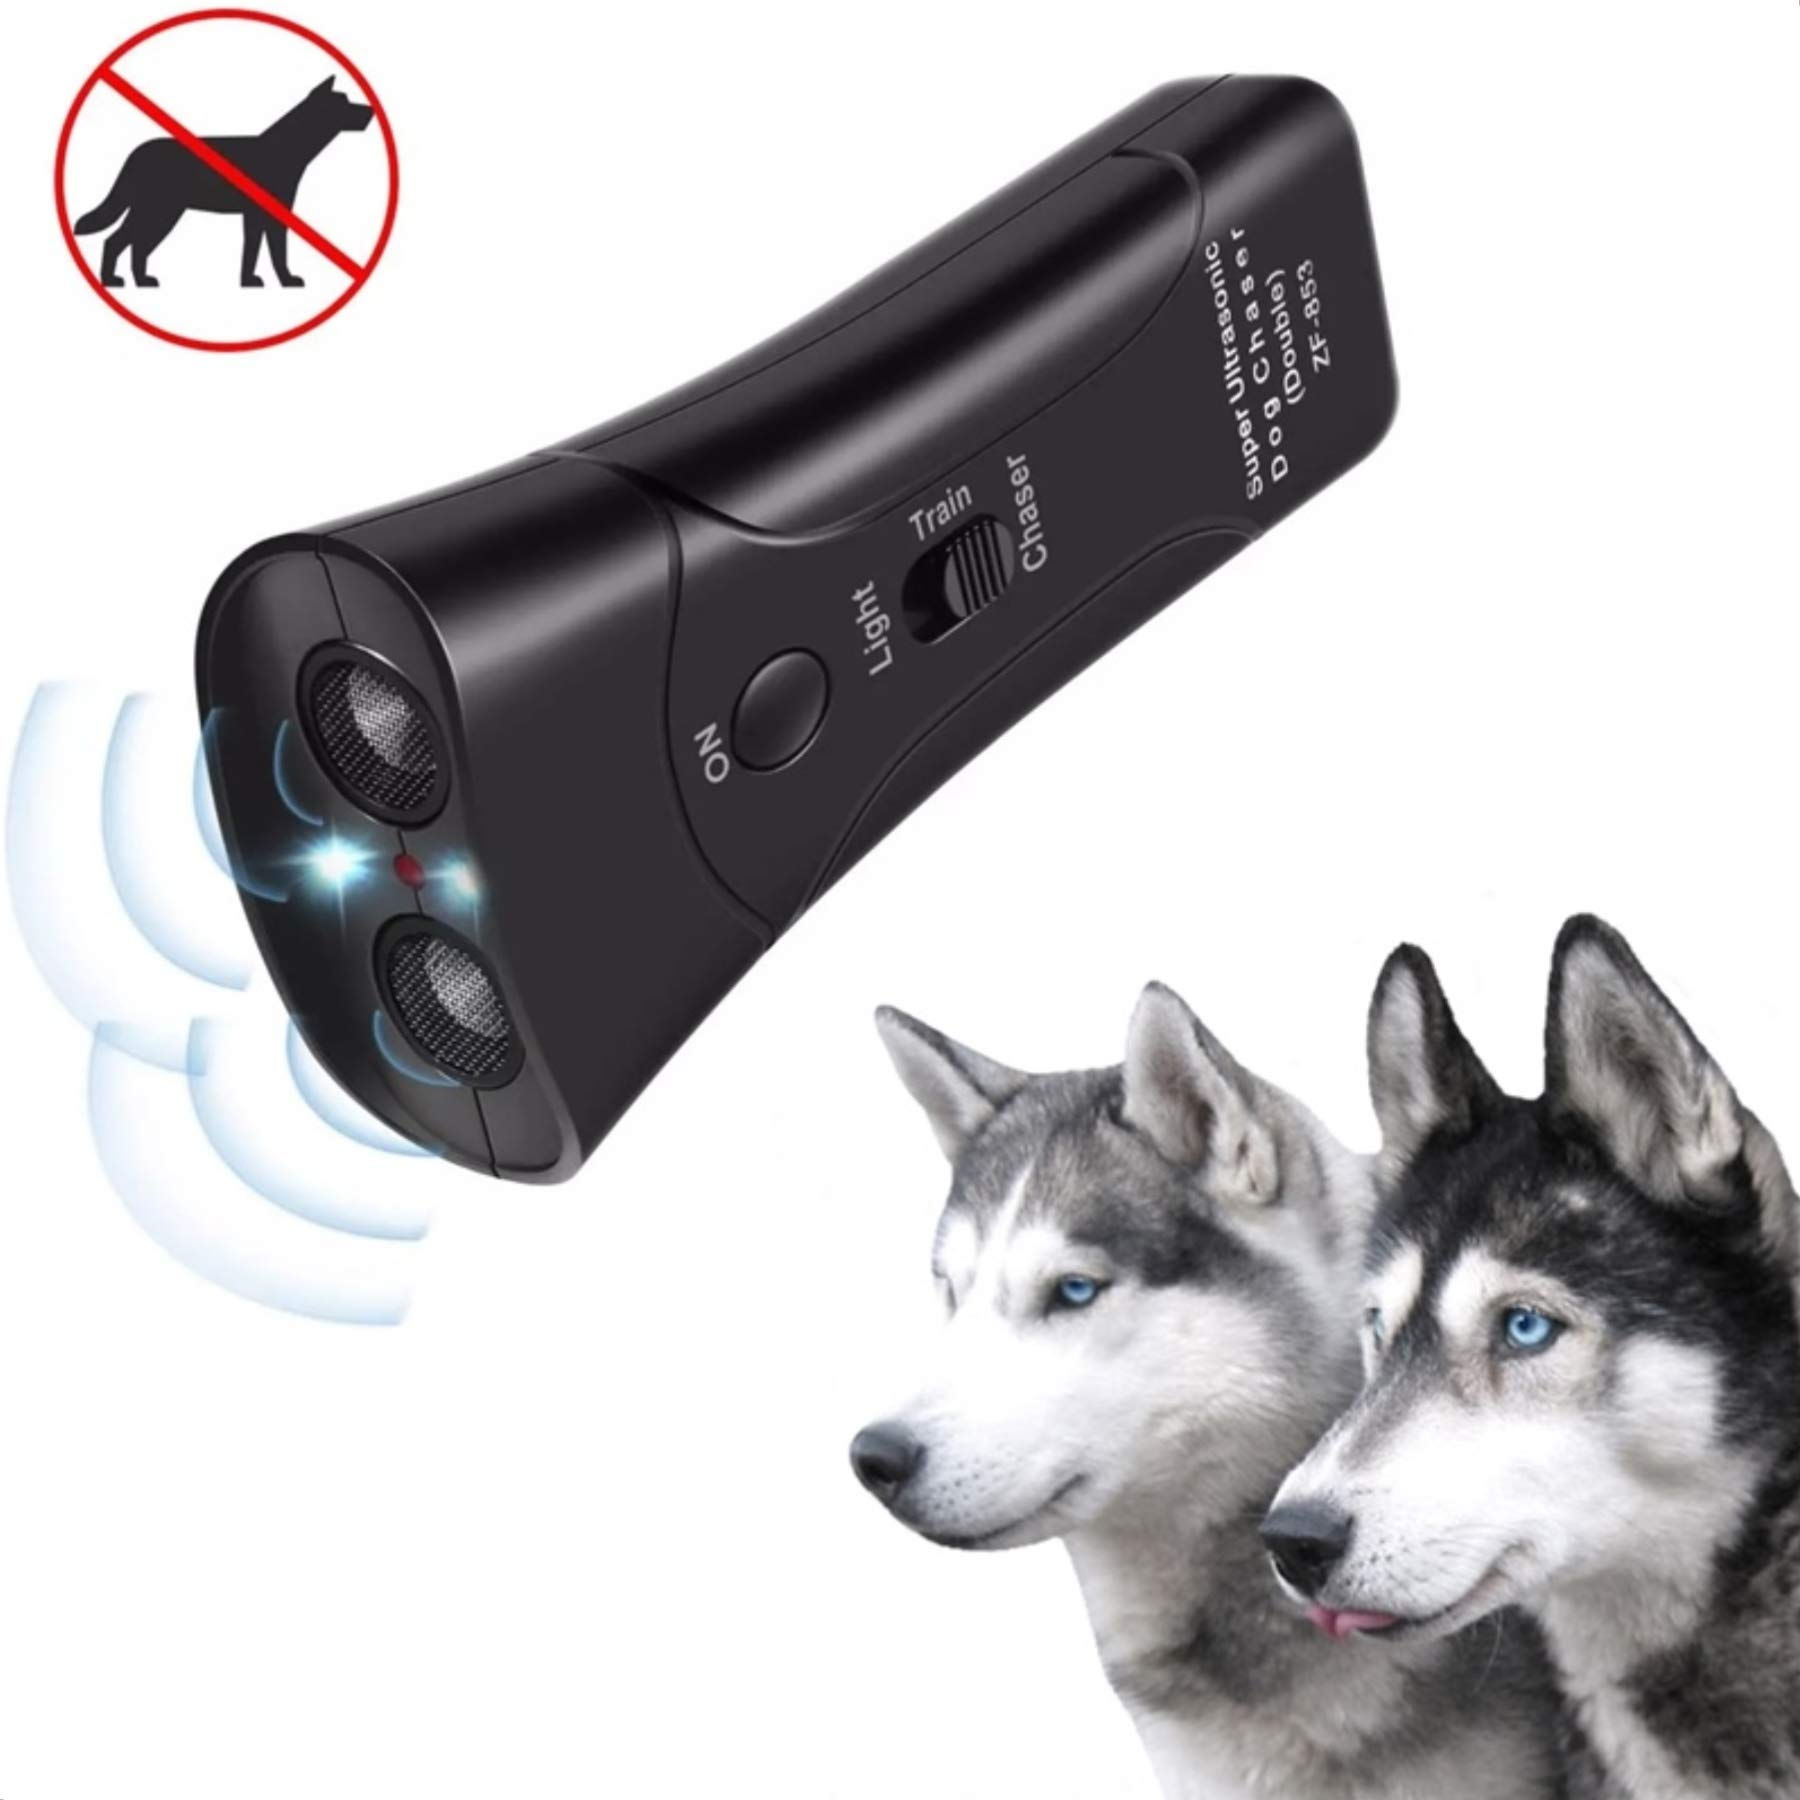 Zadyx Anti Barking Handheld 3 in 1 Pet LED Ultrasonic Dog Trainer Device - Electronic Dog Deterrent/Training Tool/Stop Barking by Zadyx